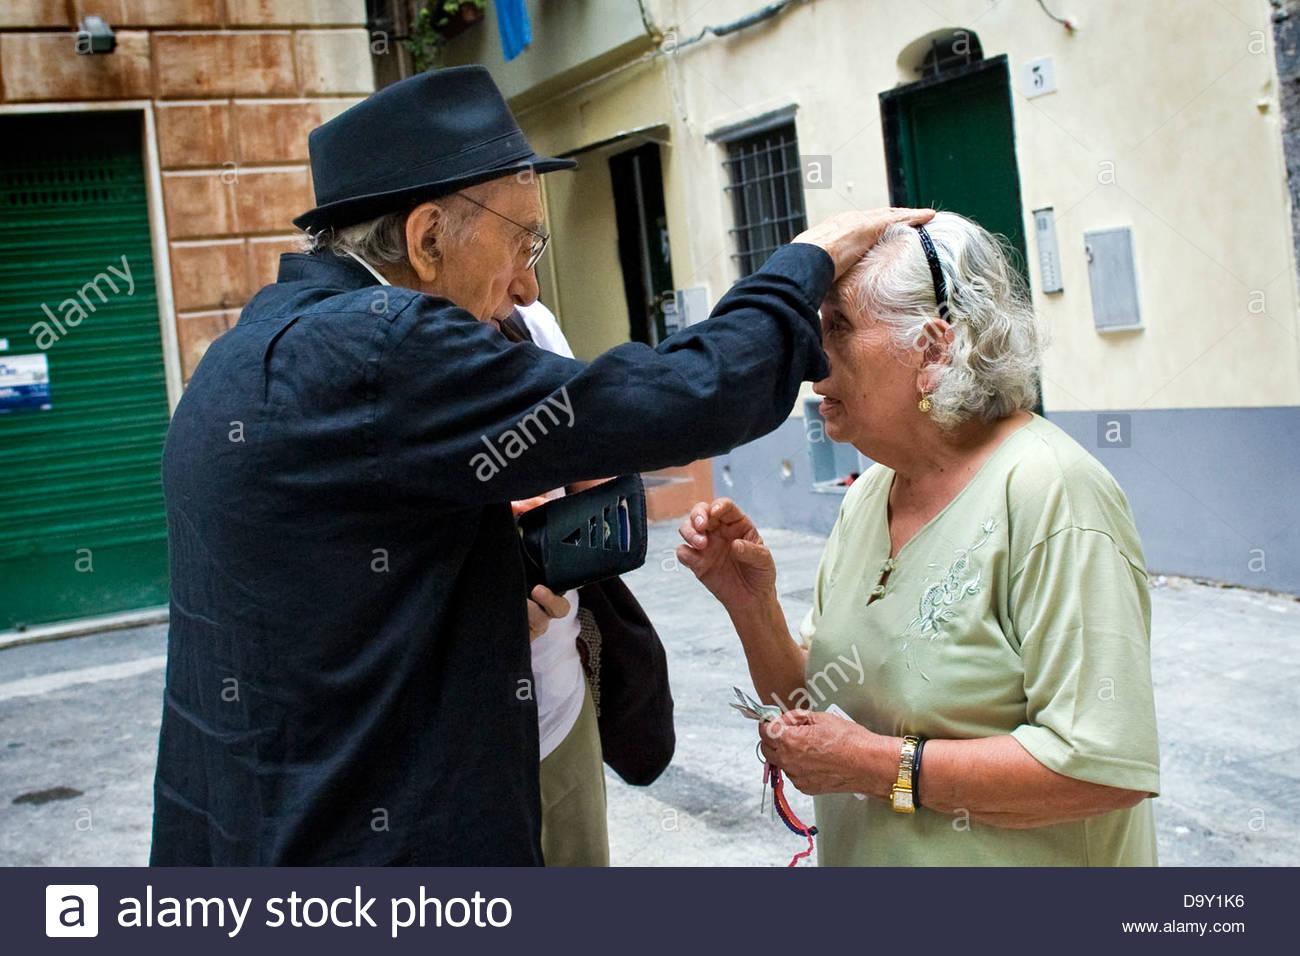 Don Andrea blesses a Peruvian woman. Don Andrea Gallo,Genoa,Italy - Stock Image